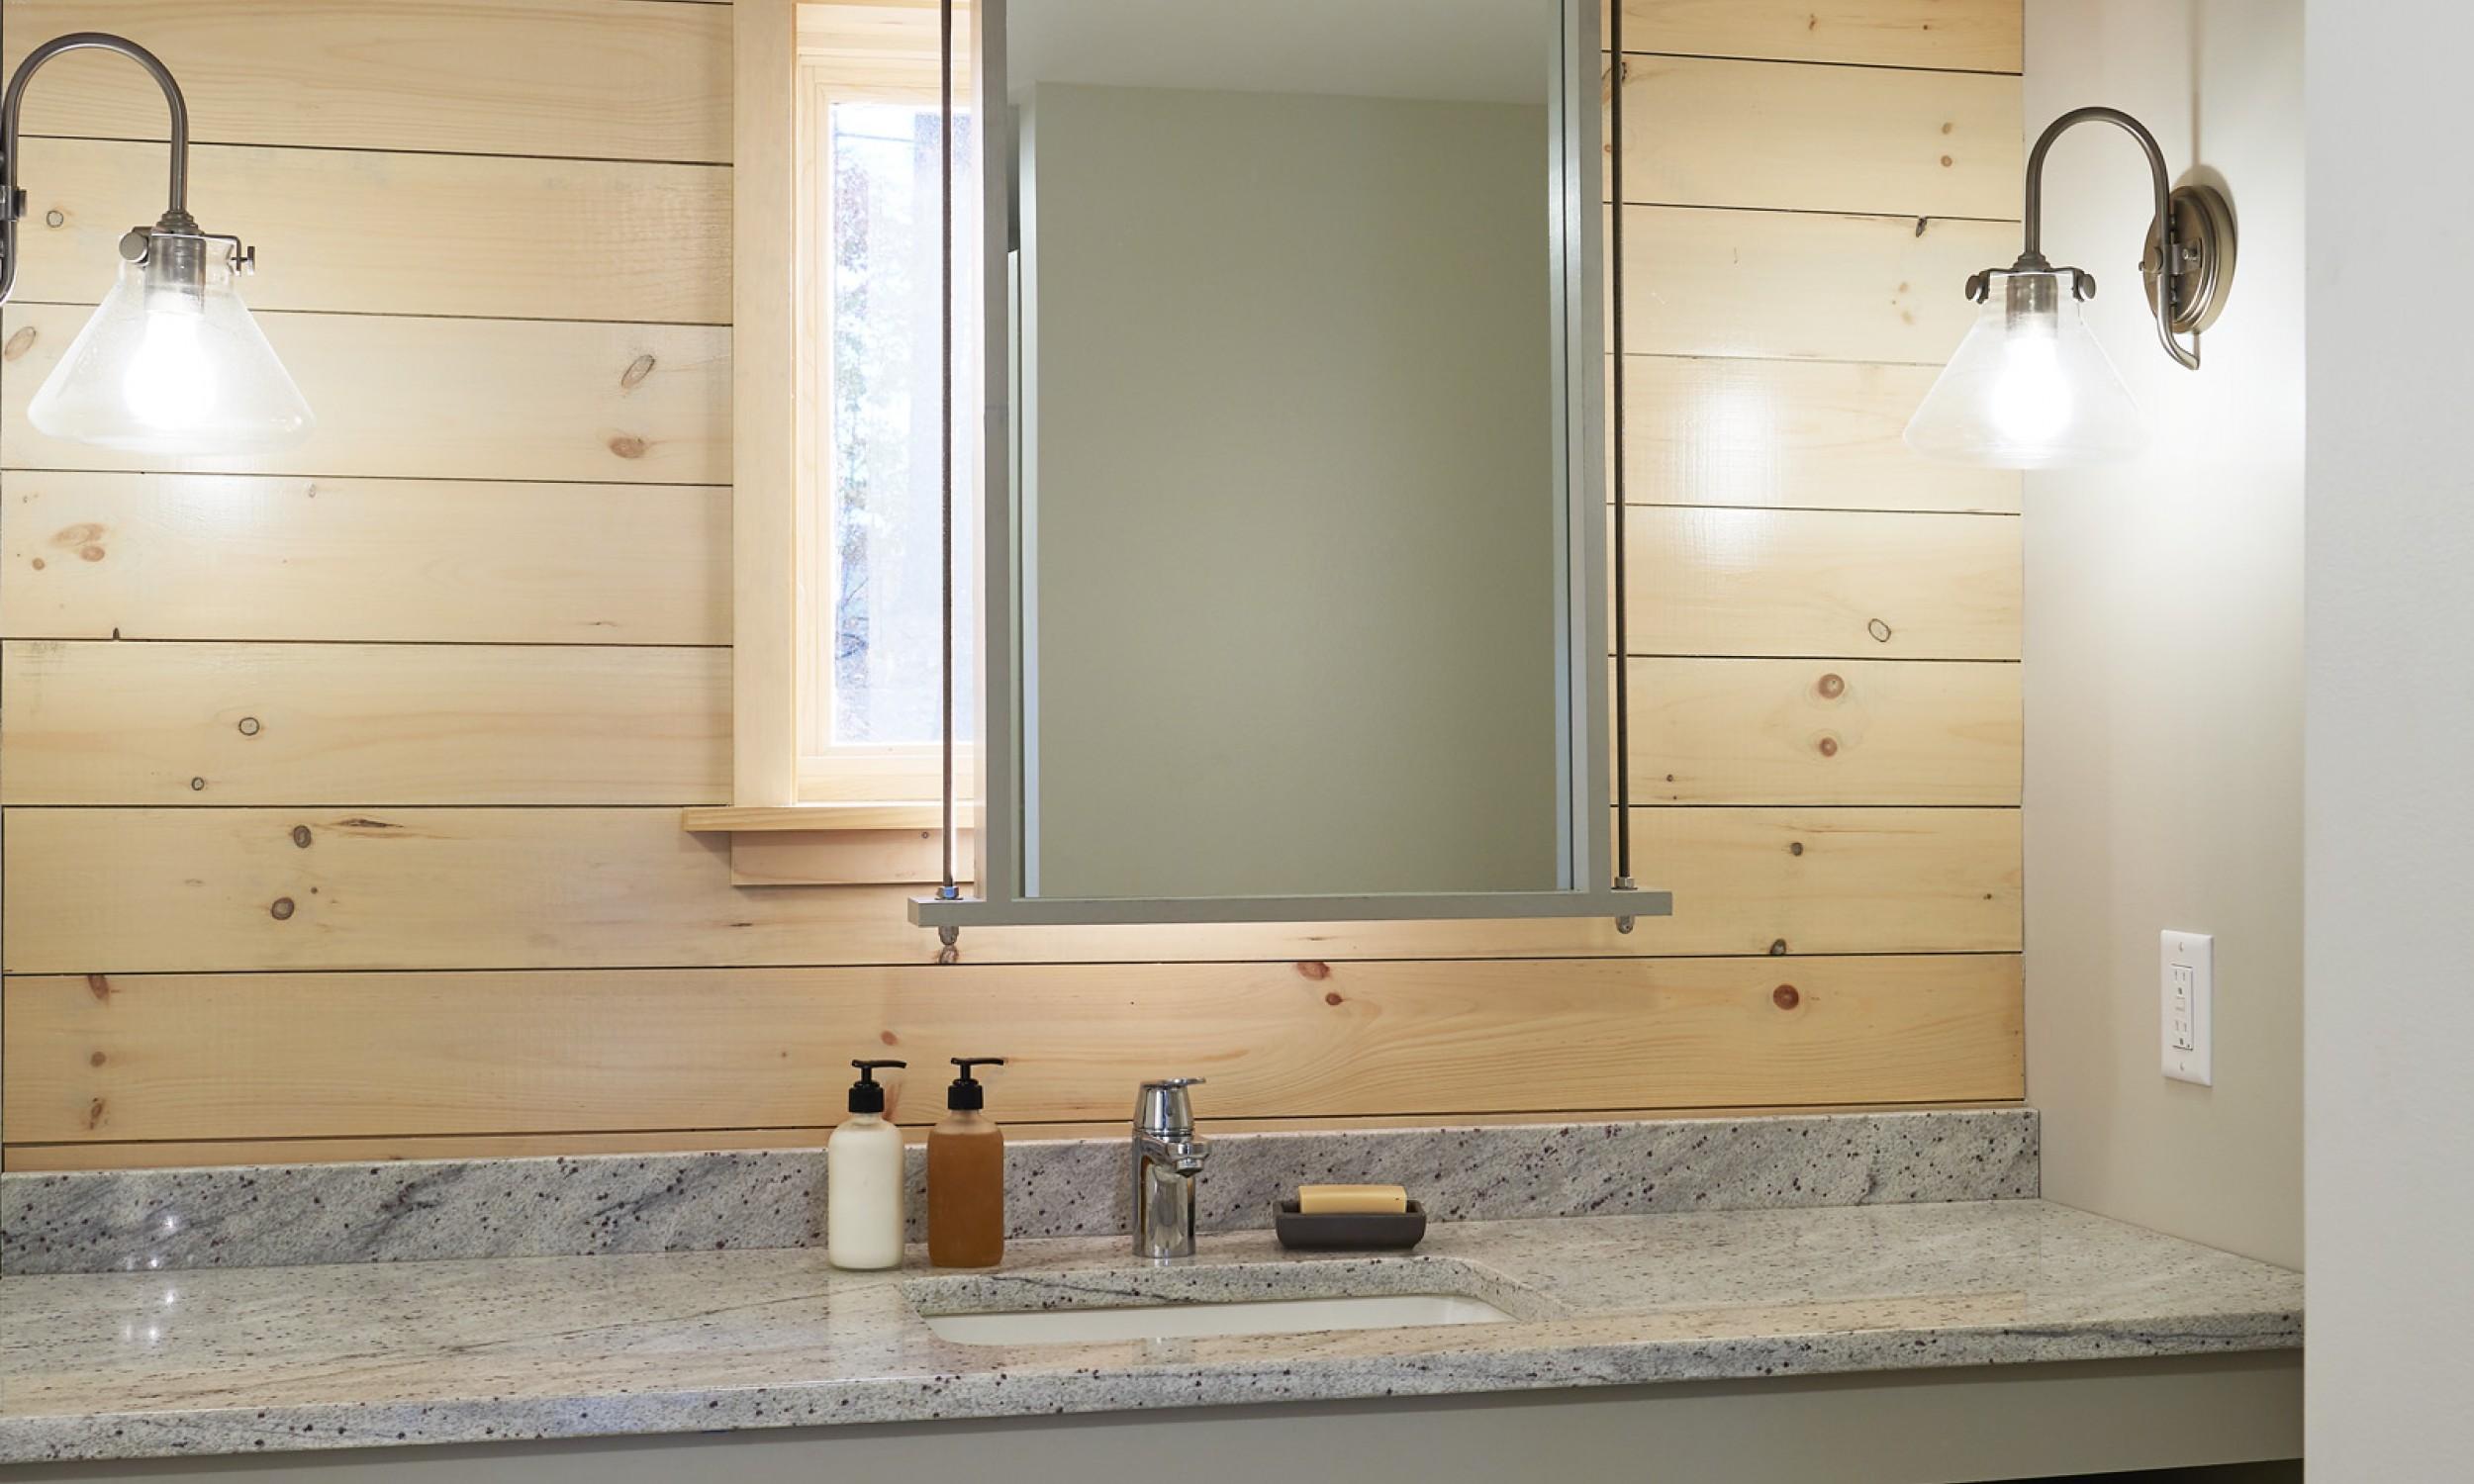 Custom designed mirror, Nickel Gap Pine, Granite counter